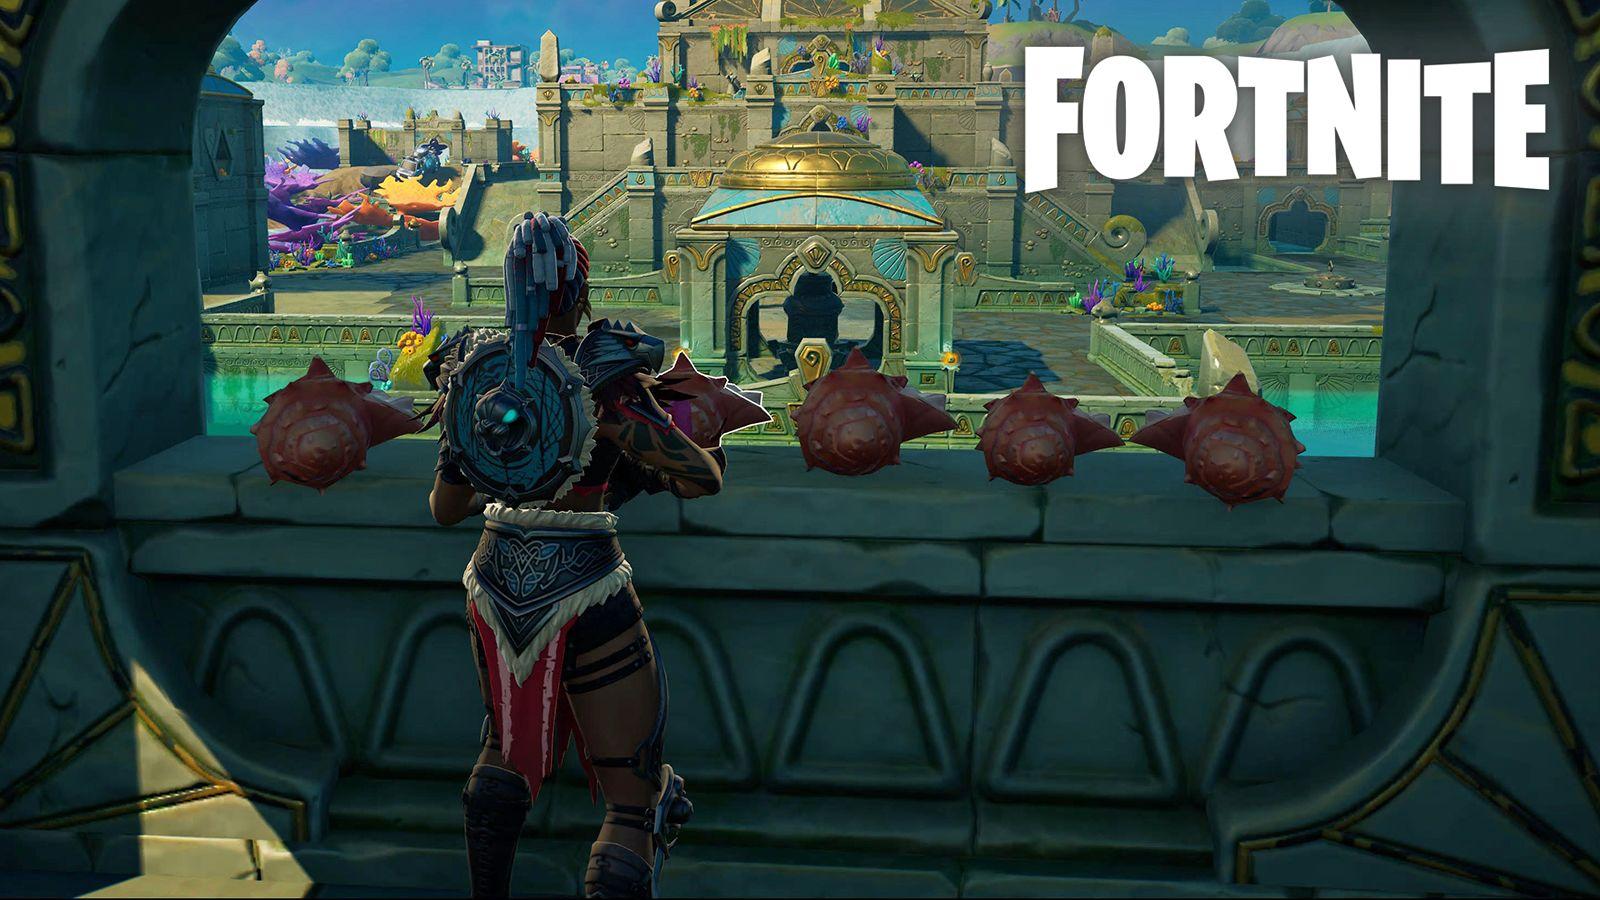 Coral Fortnite